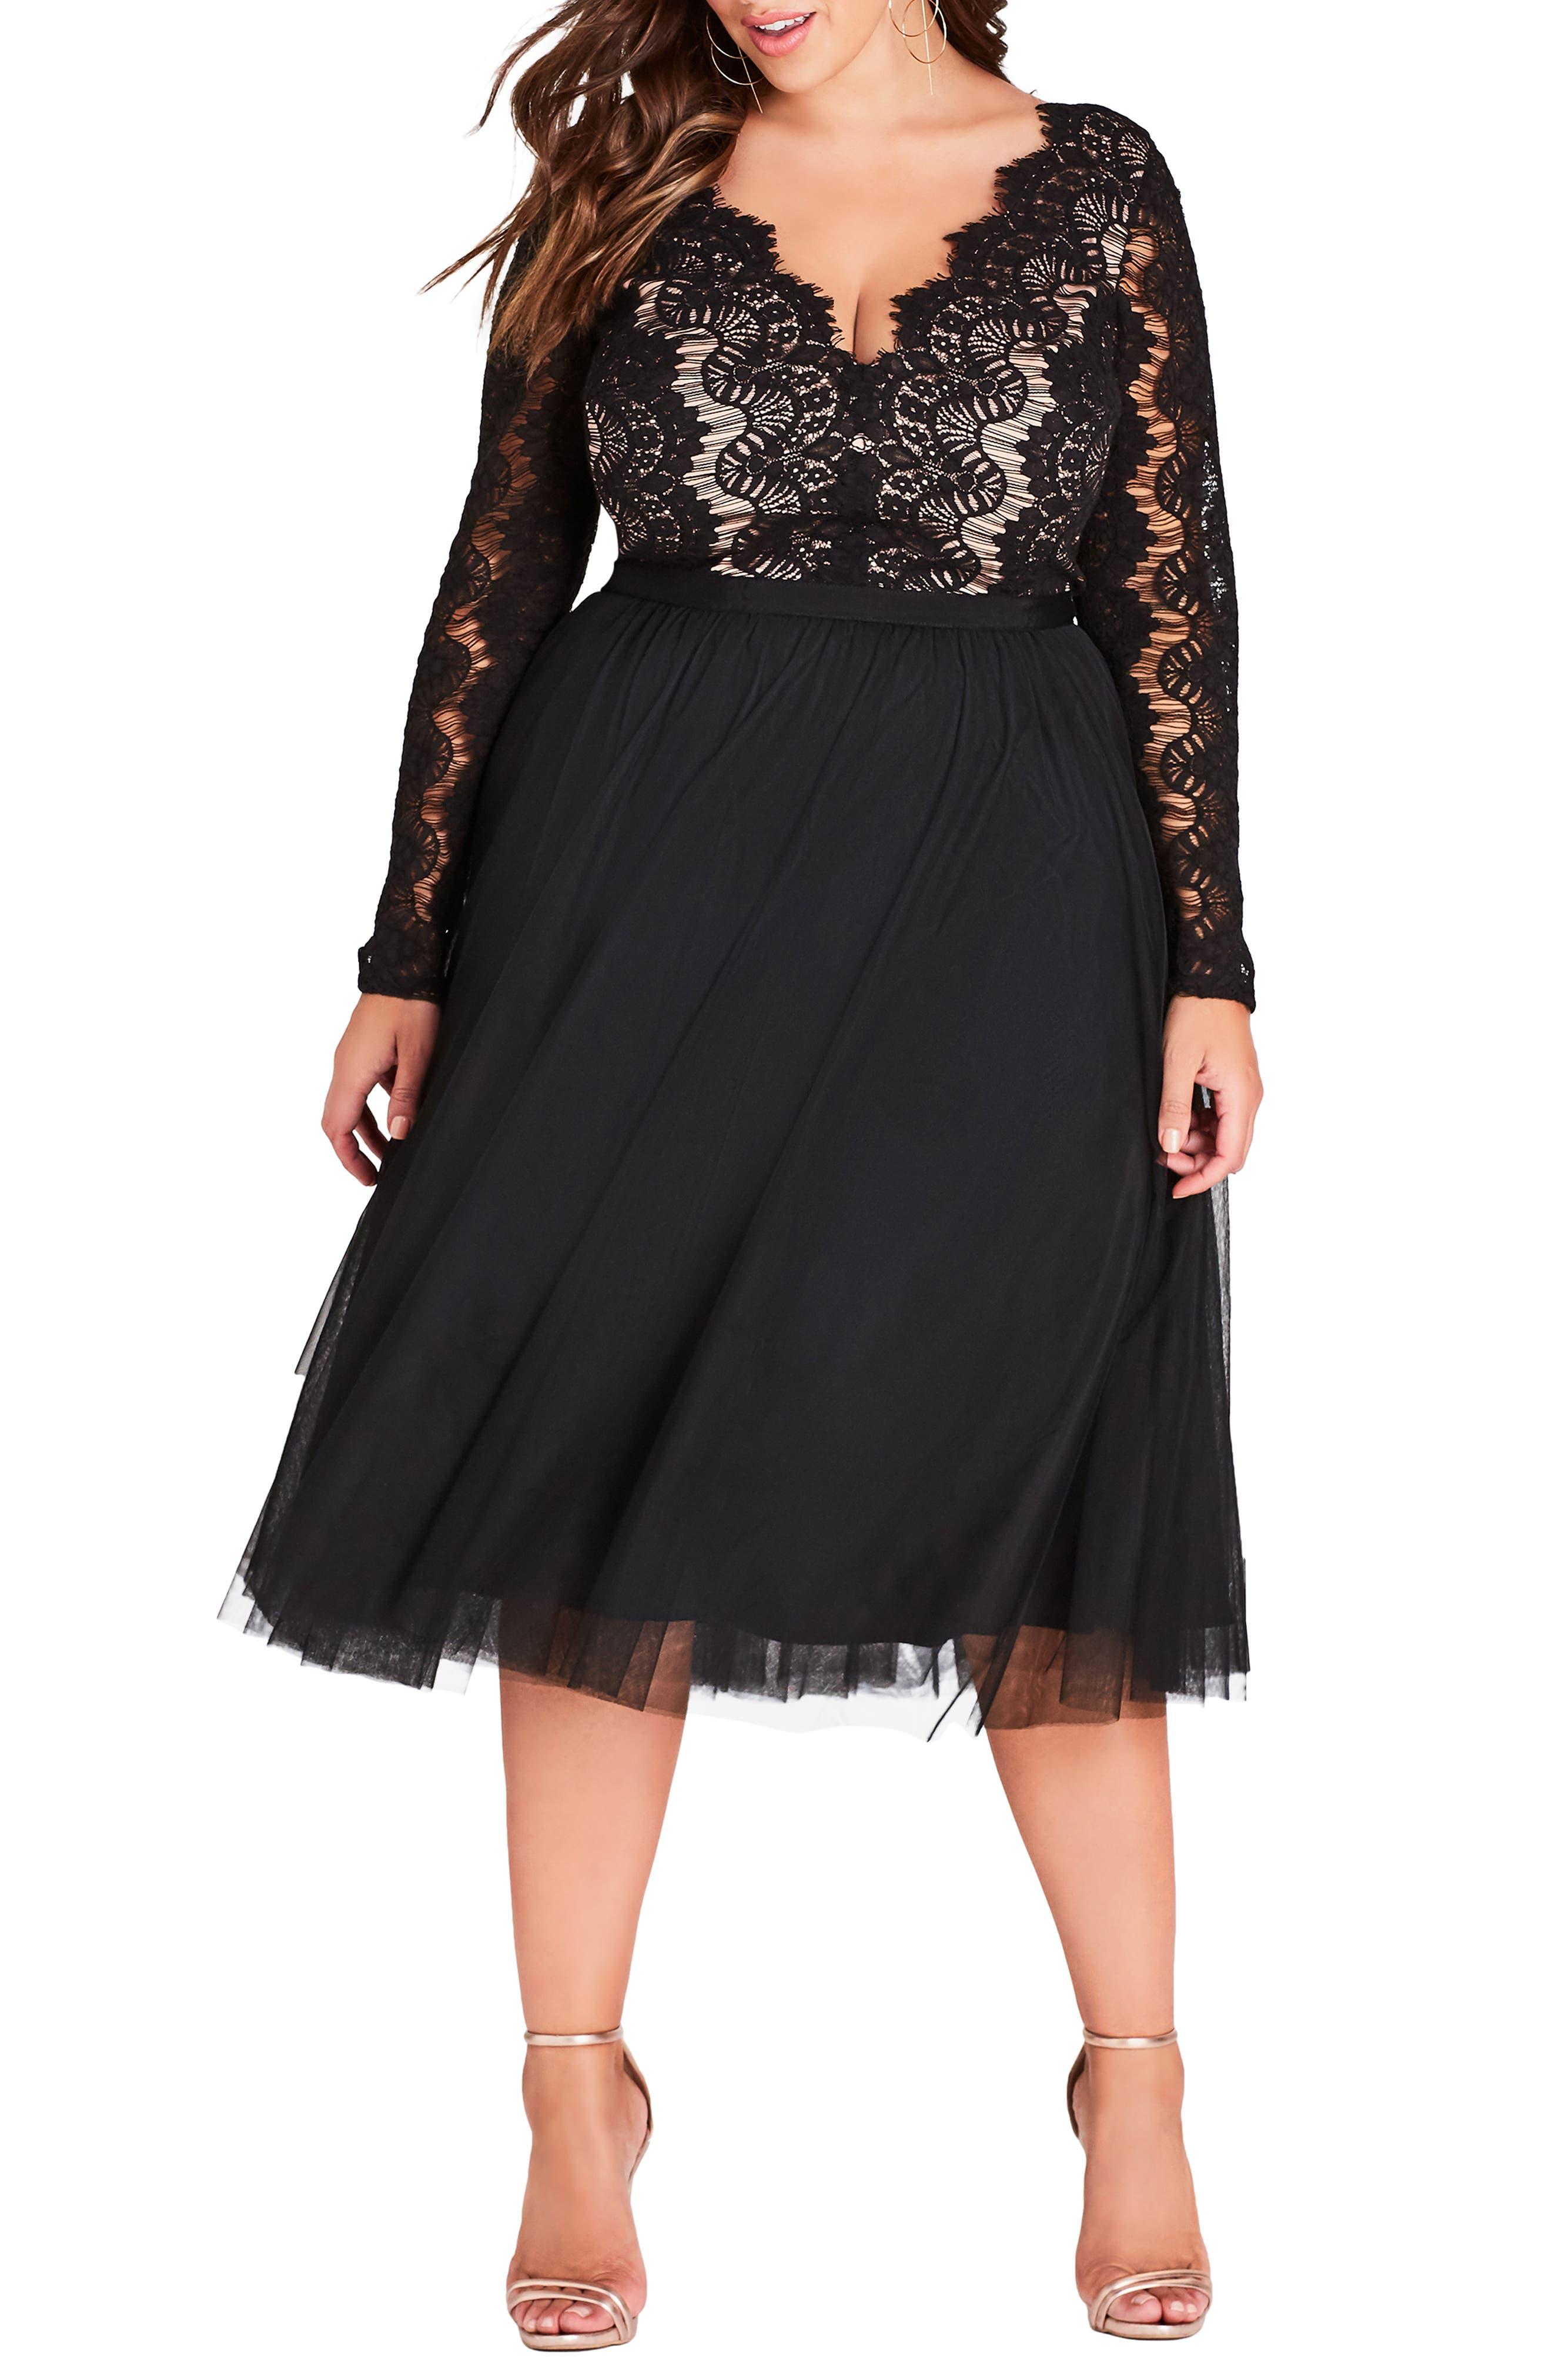 Plus Size City Chic Rare Beauty Lace Fit & Flare Dress, Black